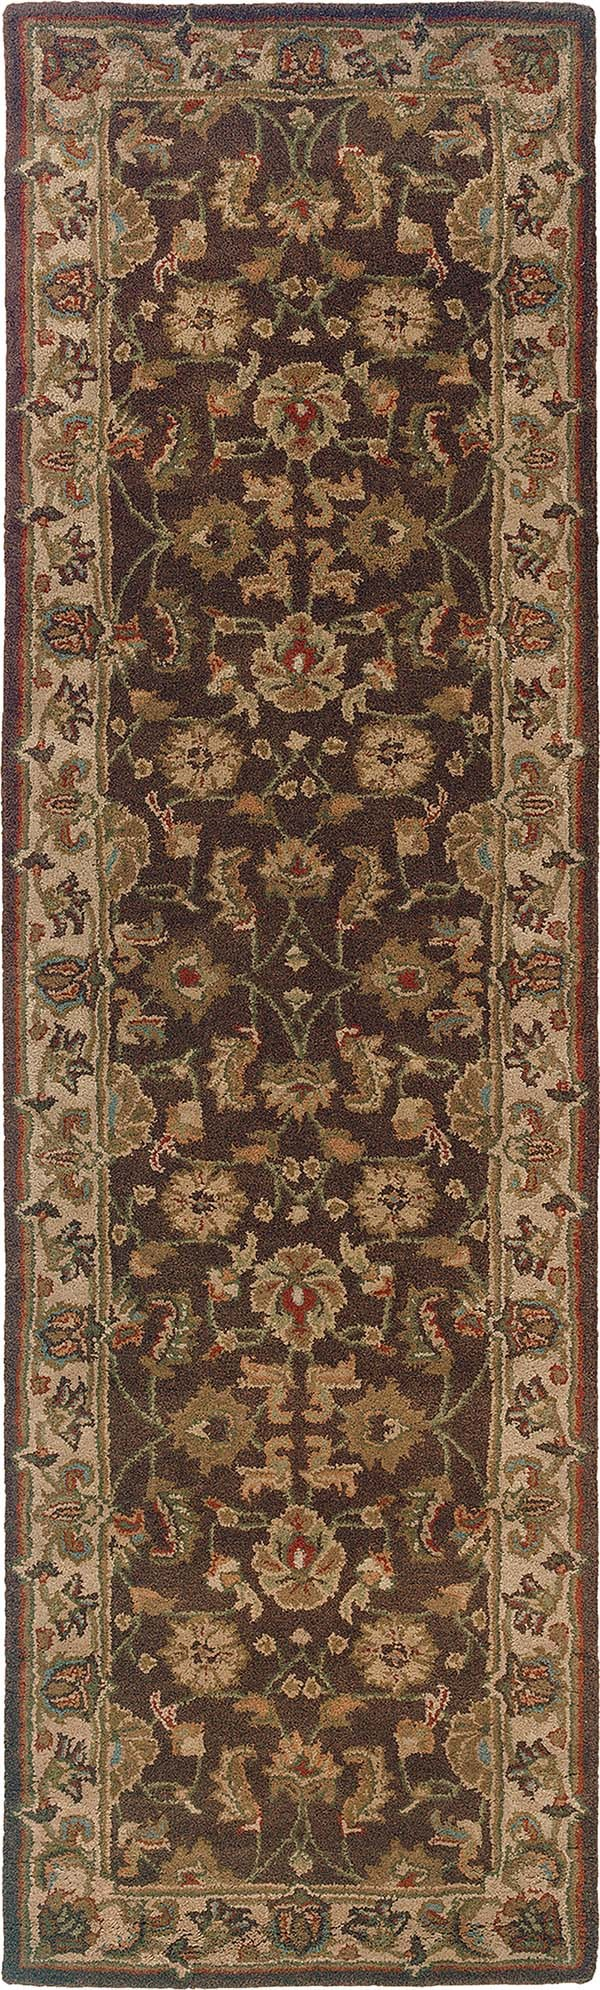 Brown, Beige Traditional / Oriental Area Rug